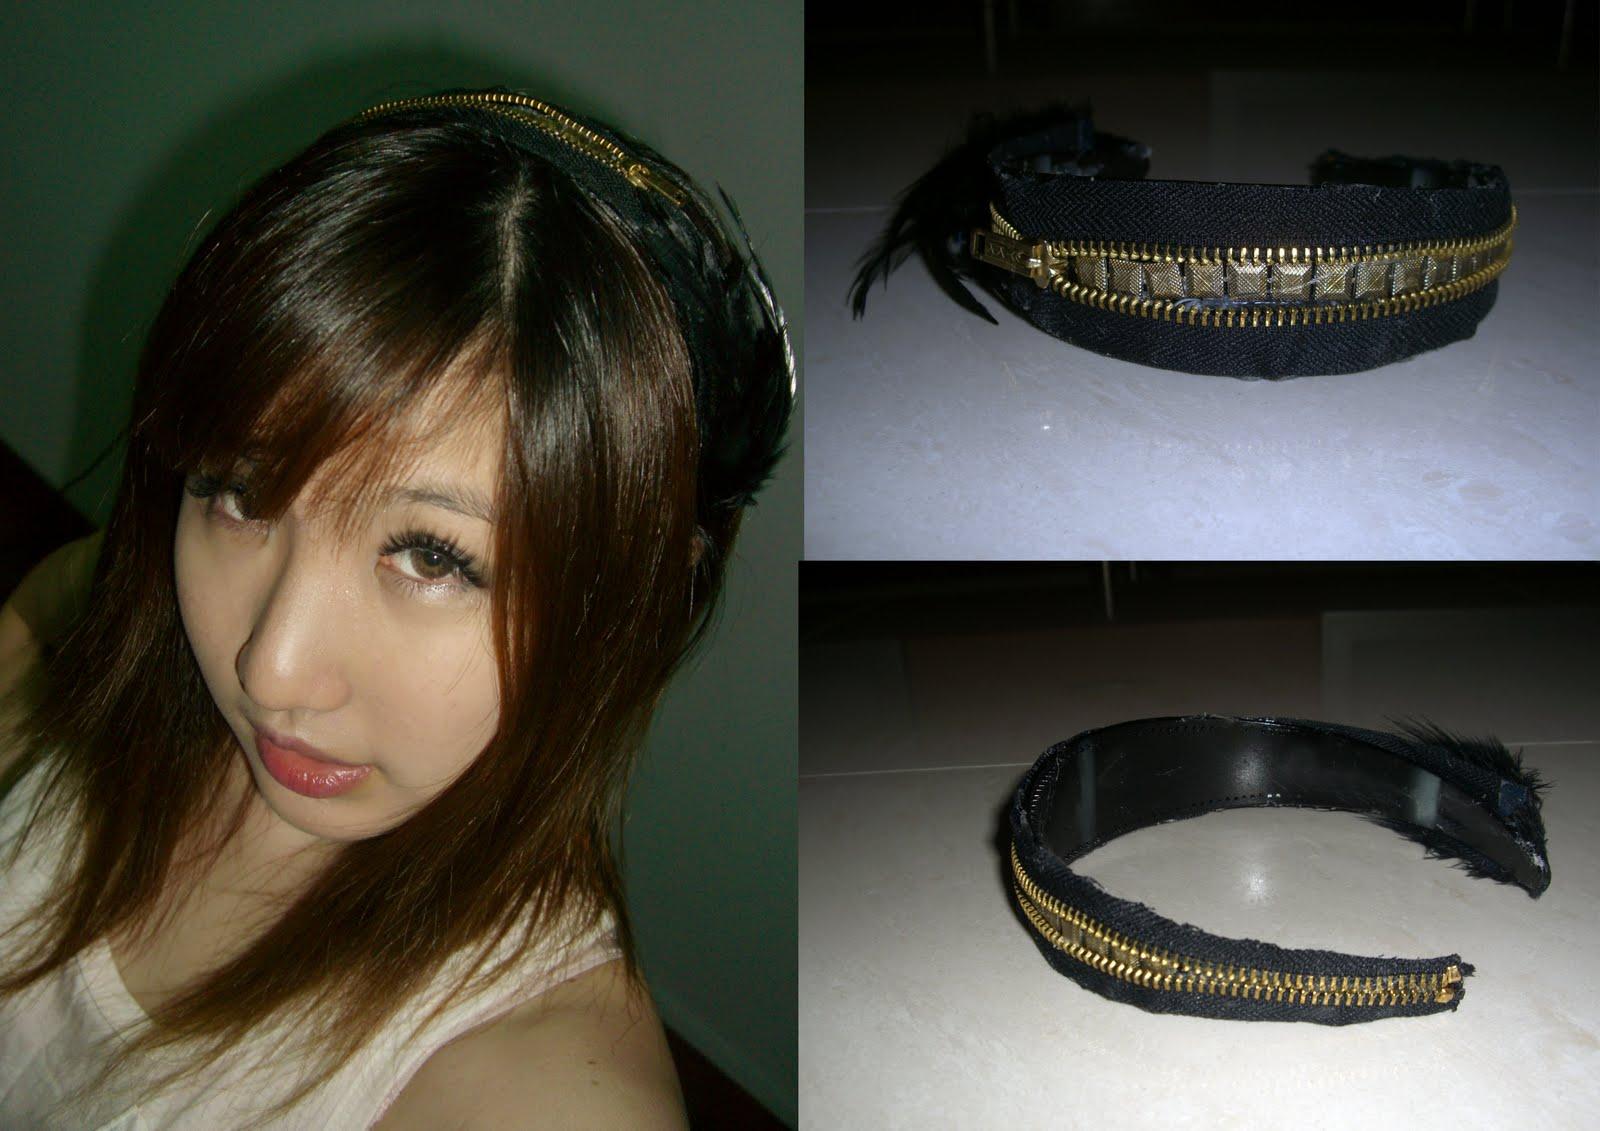 http://4.bp.blogspot.com/_3jl2eHucJ_8/TATGntG_TvI/AAAAAAAAAZc/X-5SQr_cHT8/s1600/accessories3.jpg